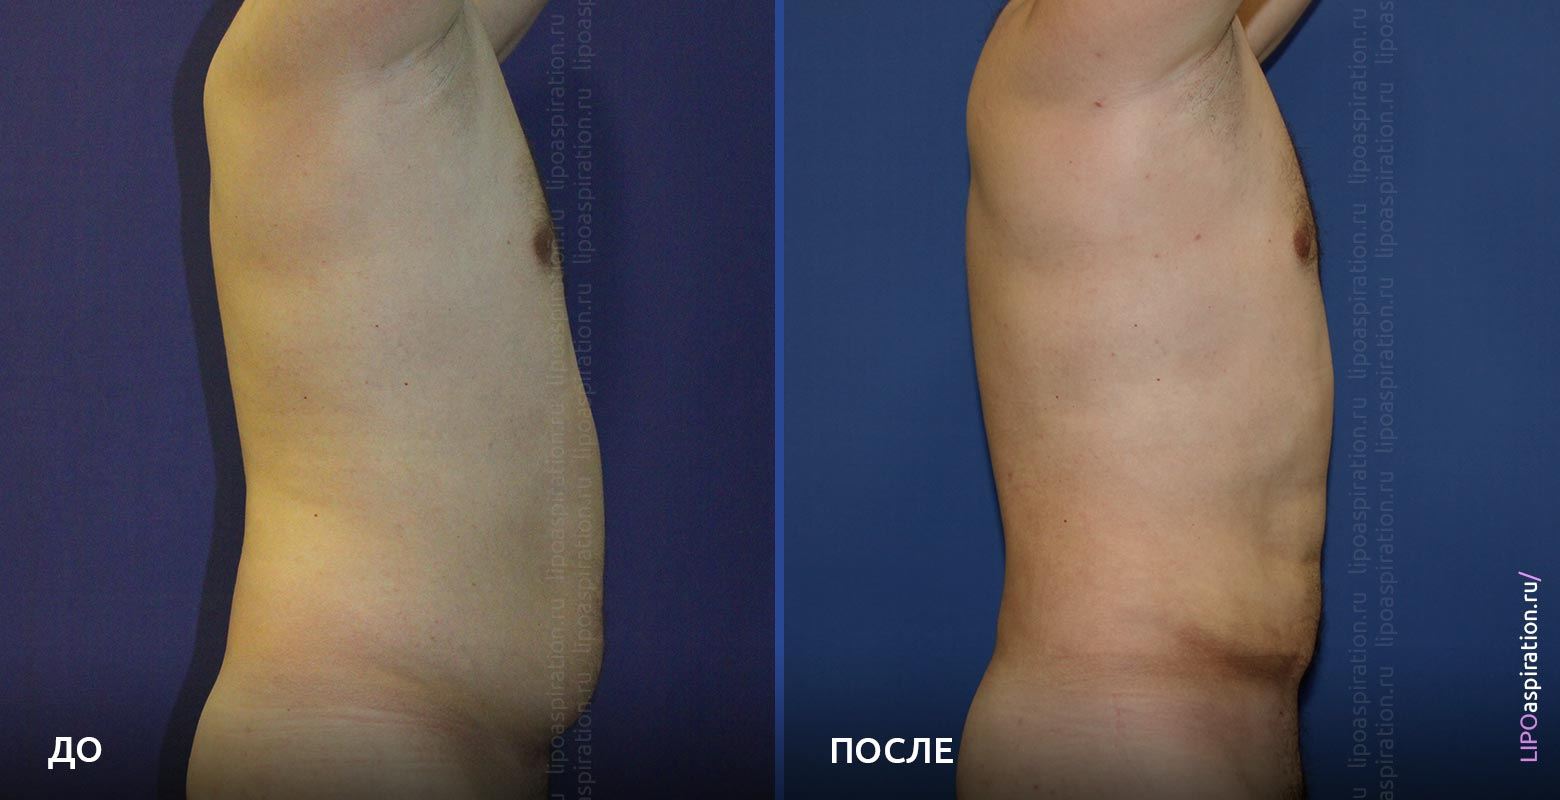 фото: до и после VASER-липосакции